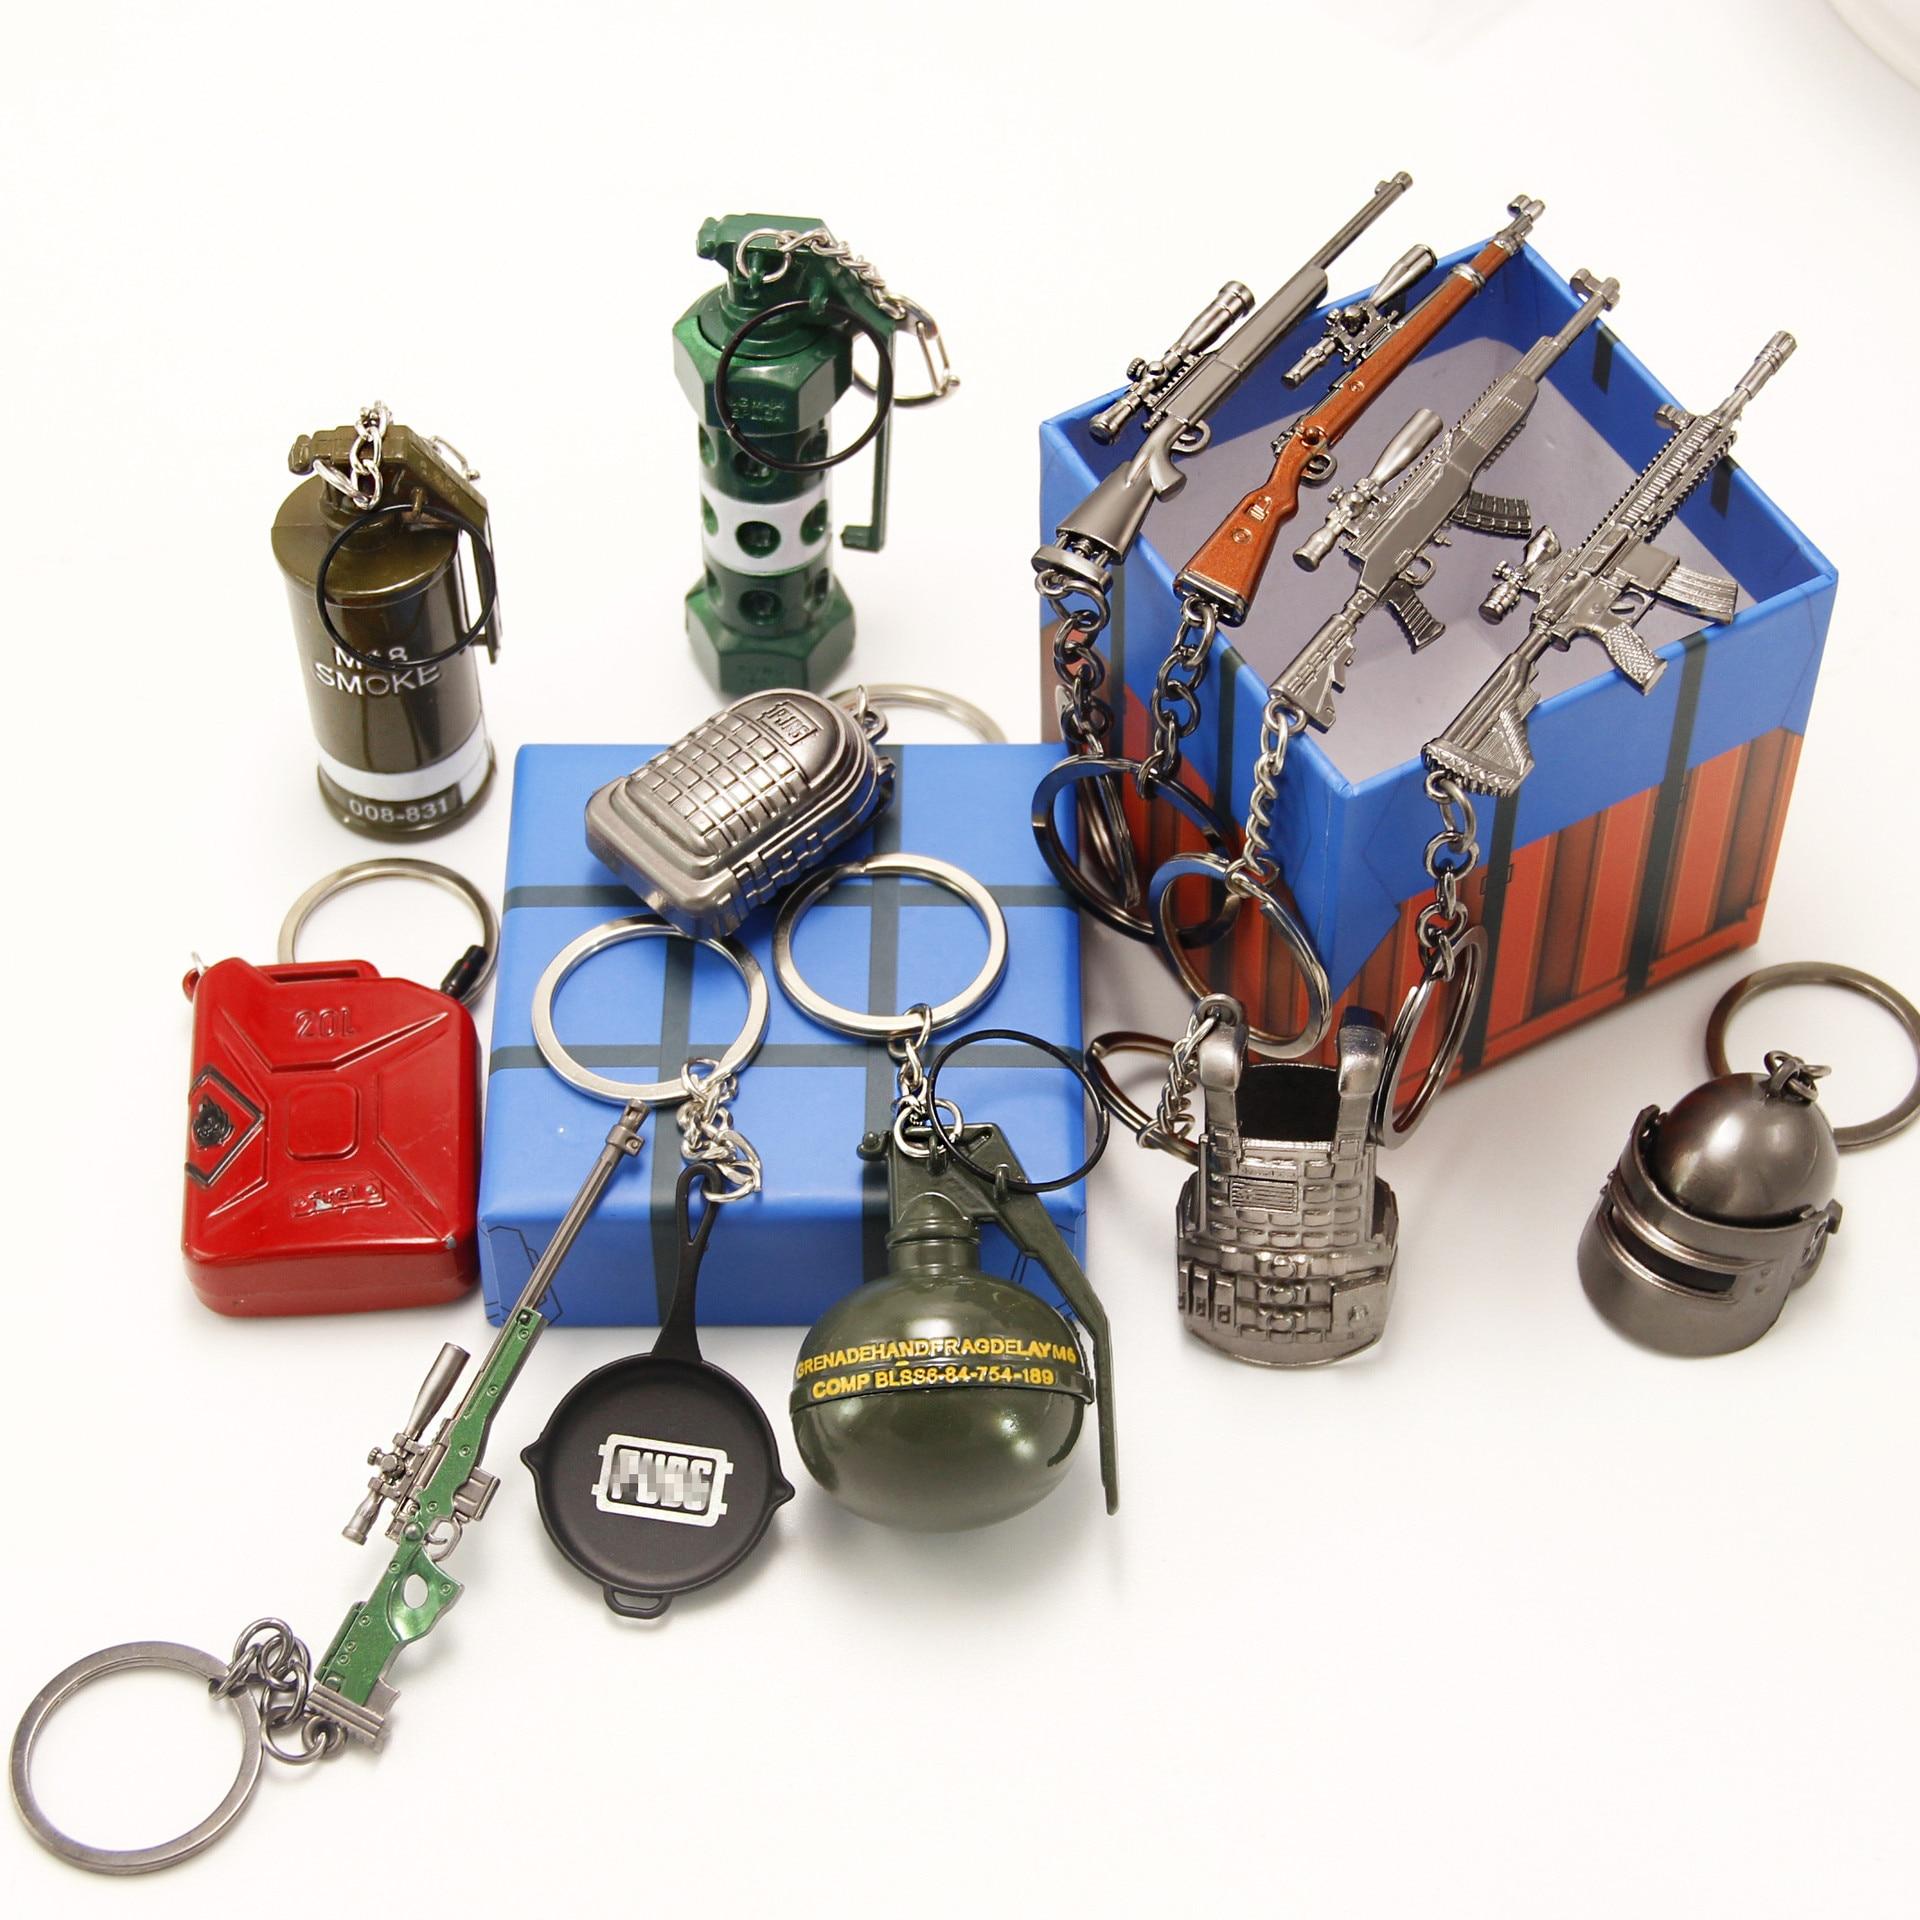 2020 Game PUBG Keychain Cosplay Props Stun Grenade Smoke Grenade Shard Grenade Gun Weapon Toy Key Chain Christmas